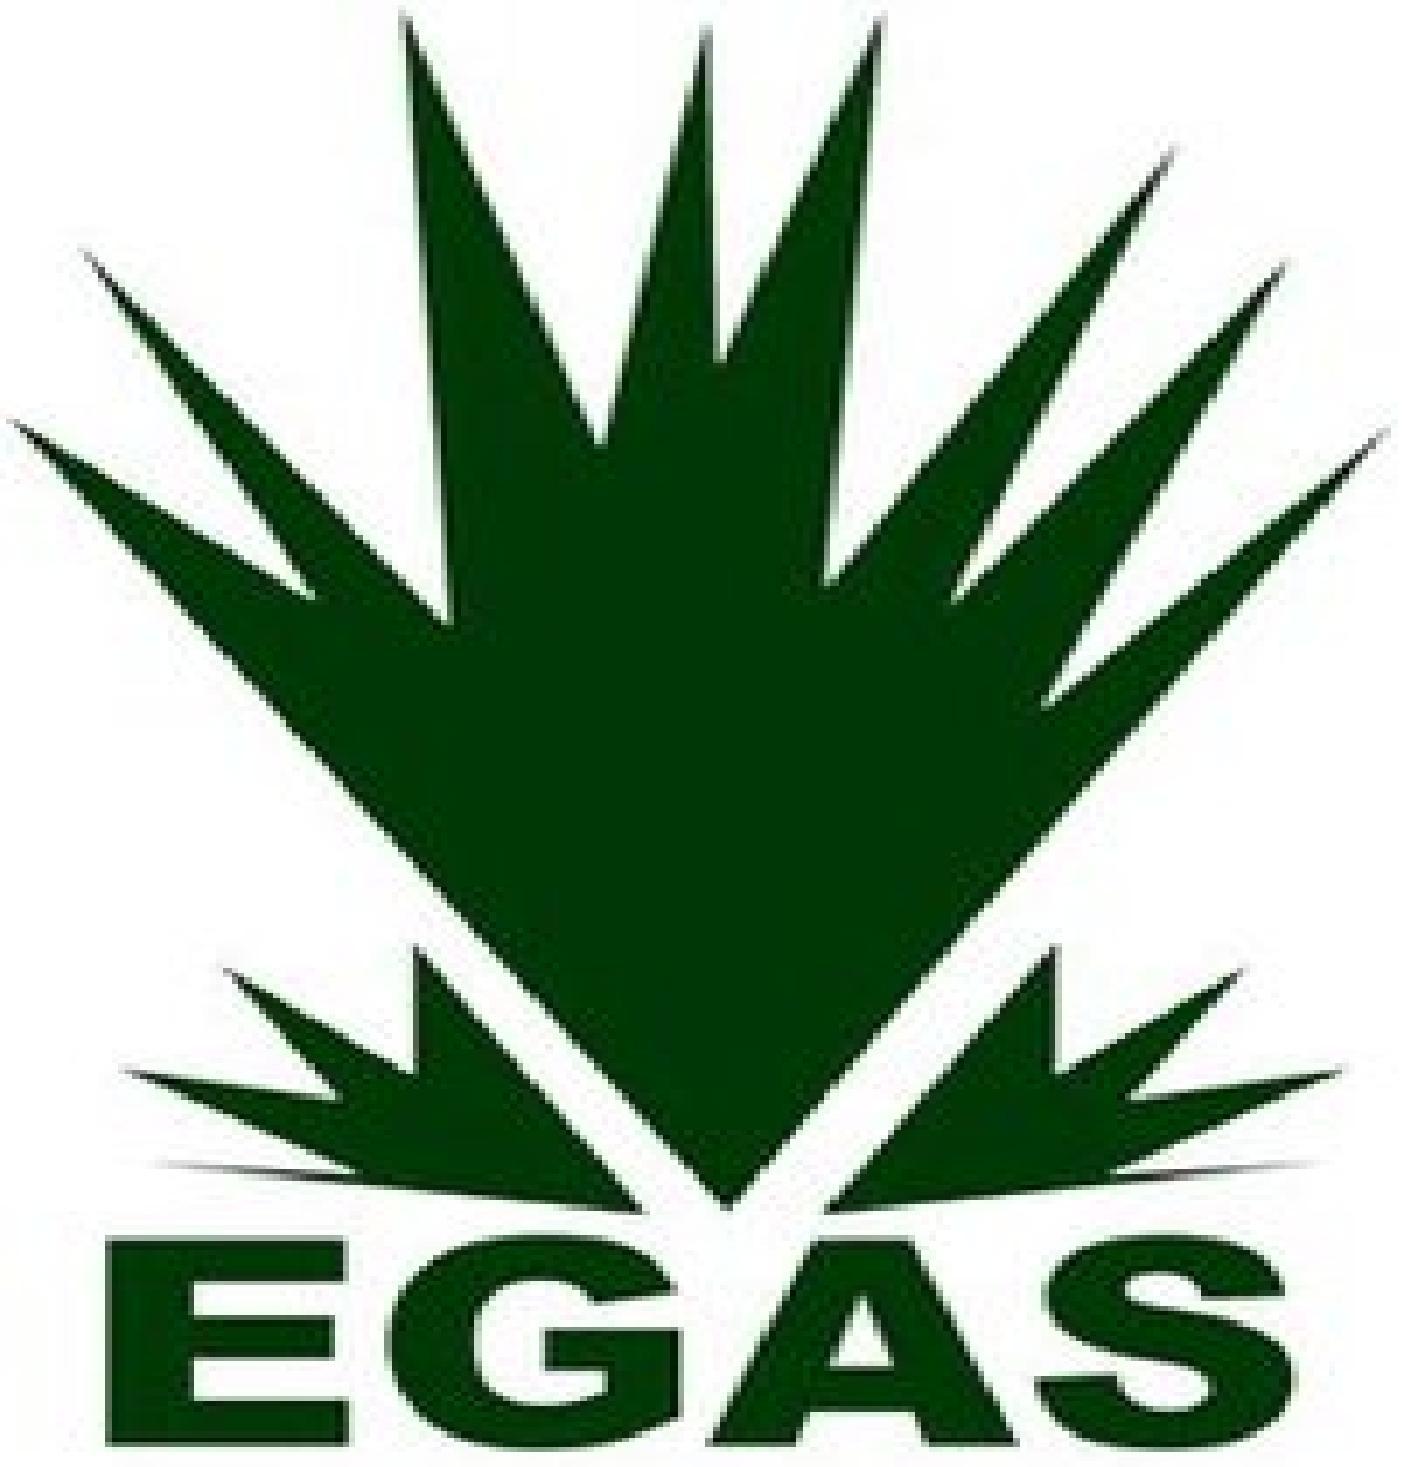 Egyptian Natural Gas Holding Company Egas